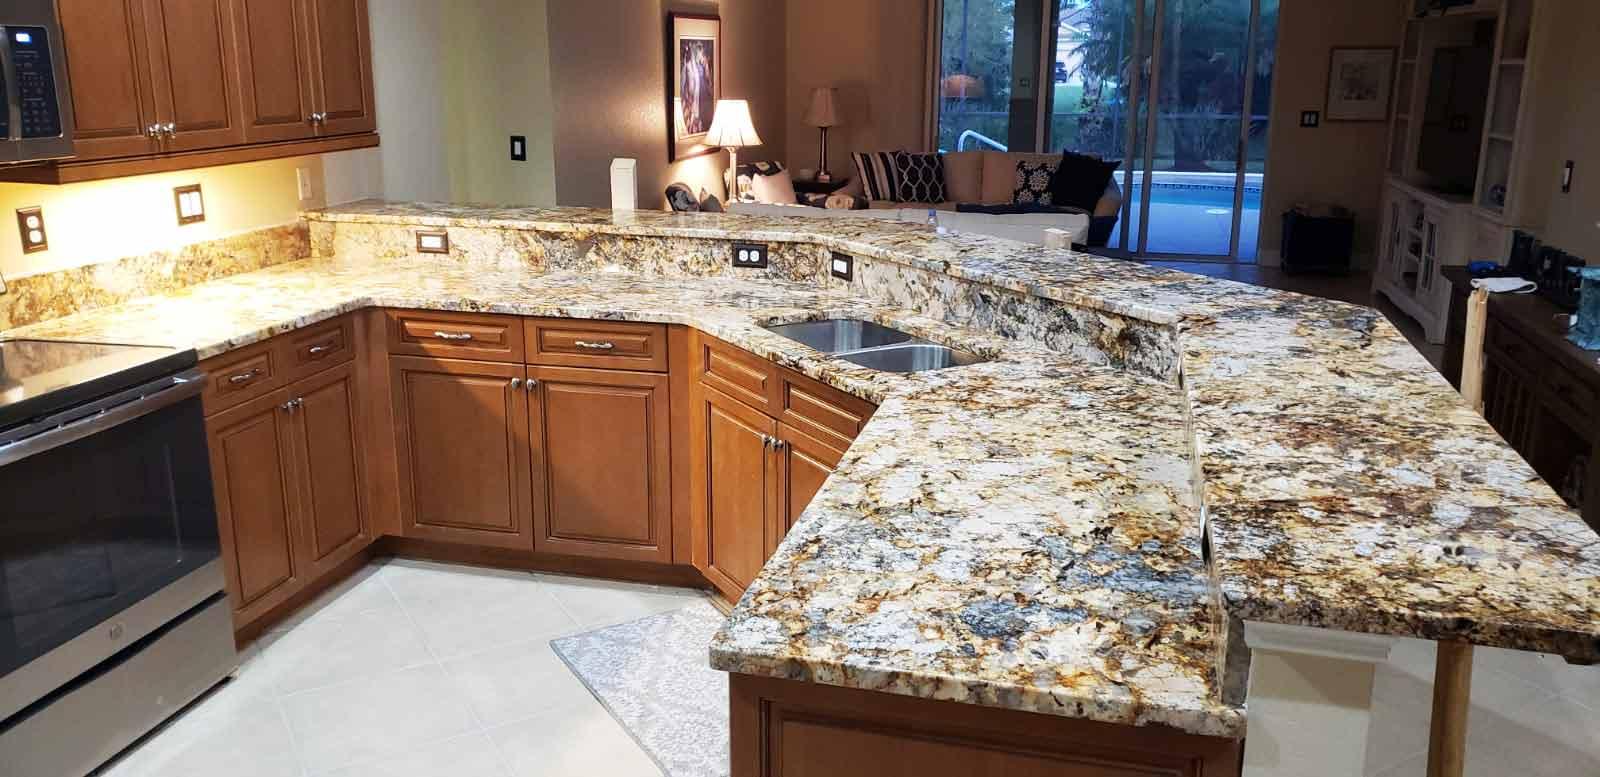 Top Granite Kitchen Of The Week Countertops More